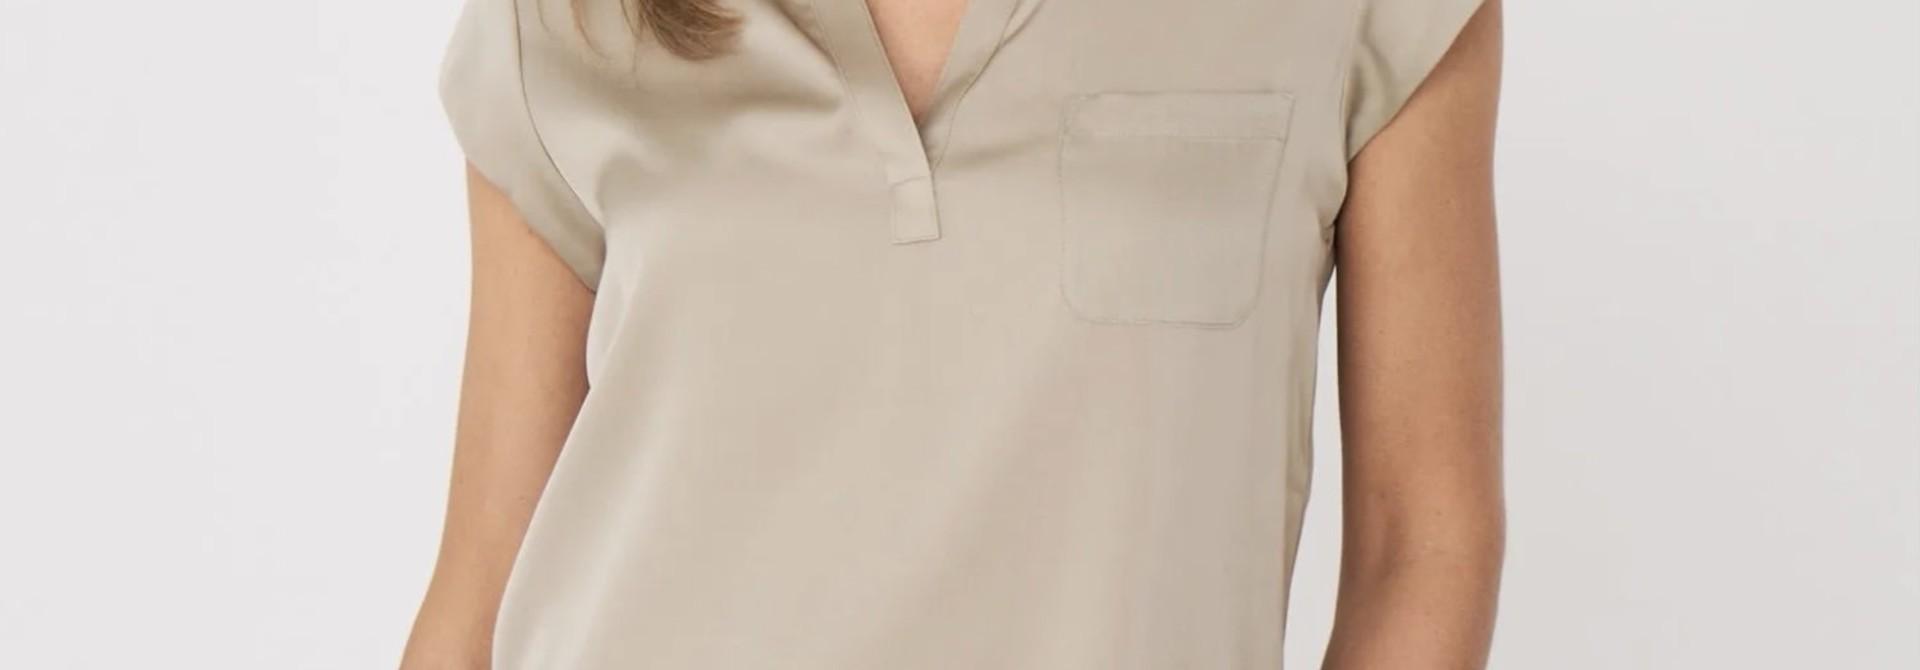 blouse repeat 600003